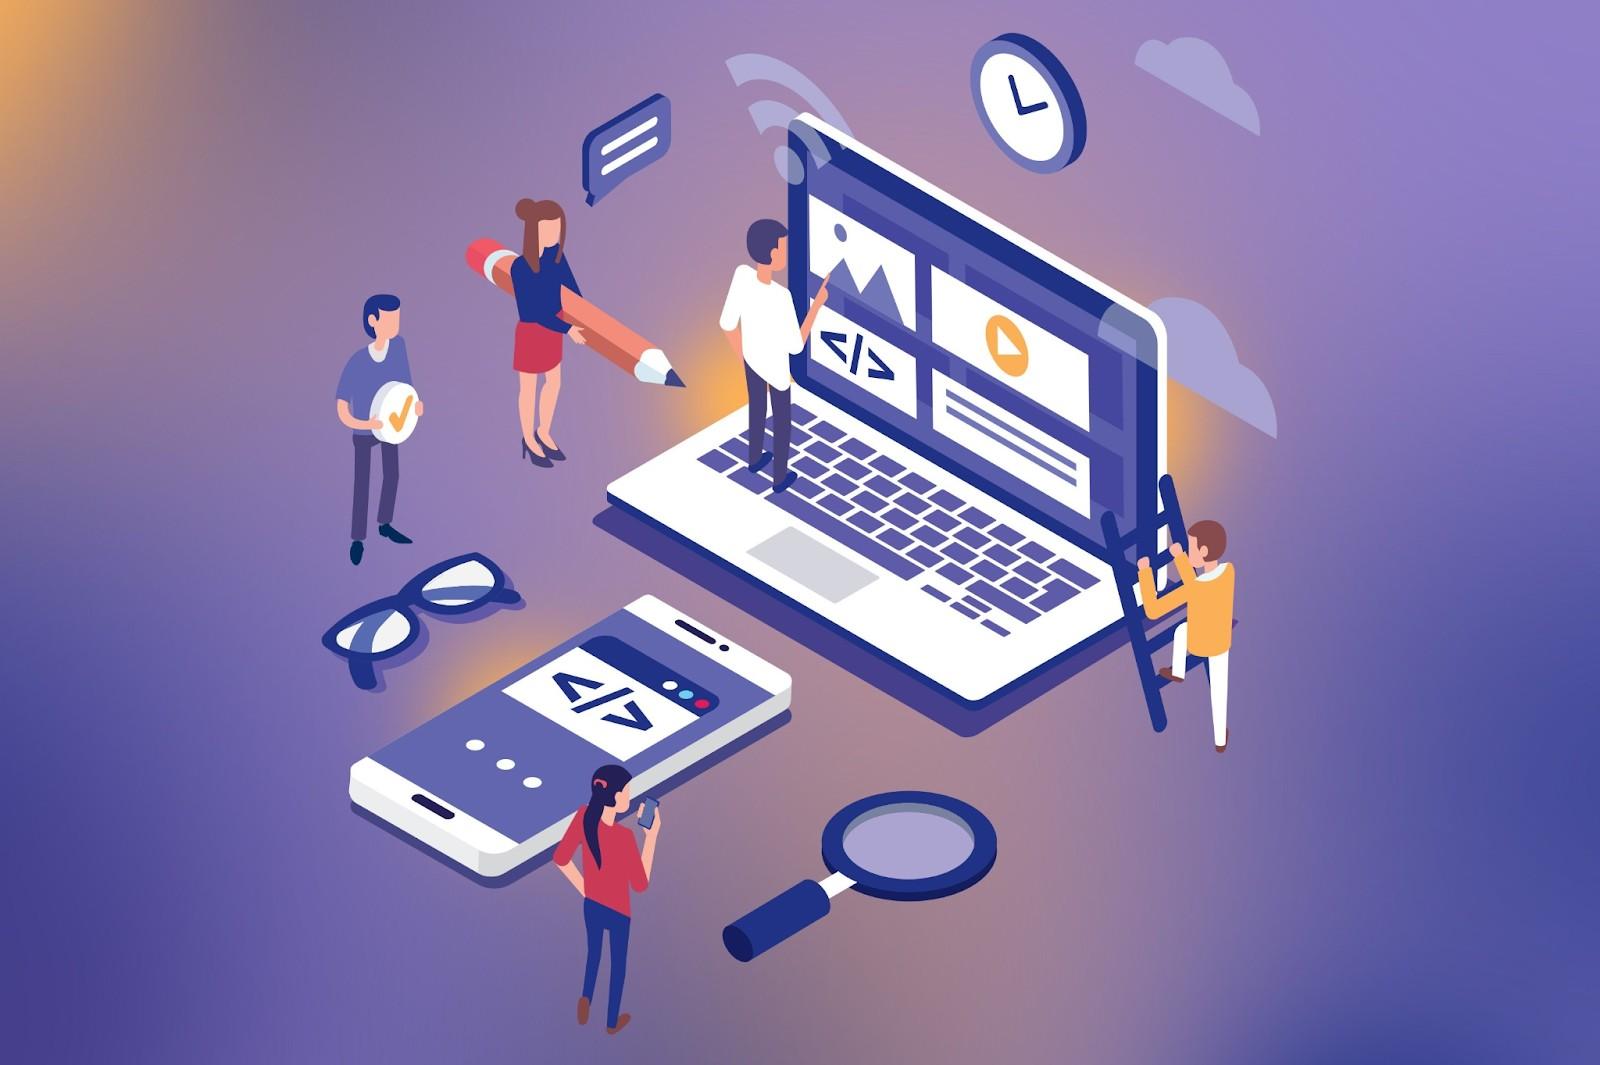 Web App Development Platforms | ConvrtX